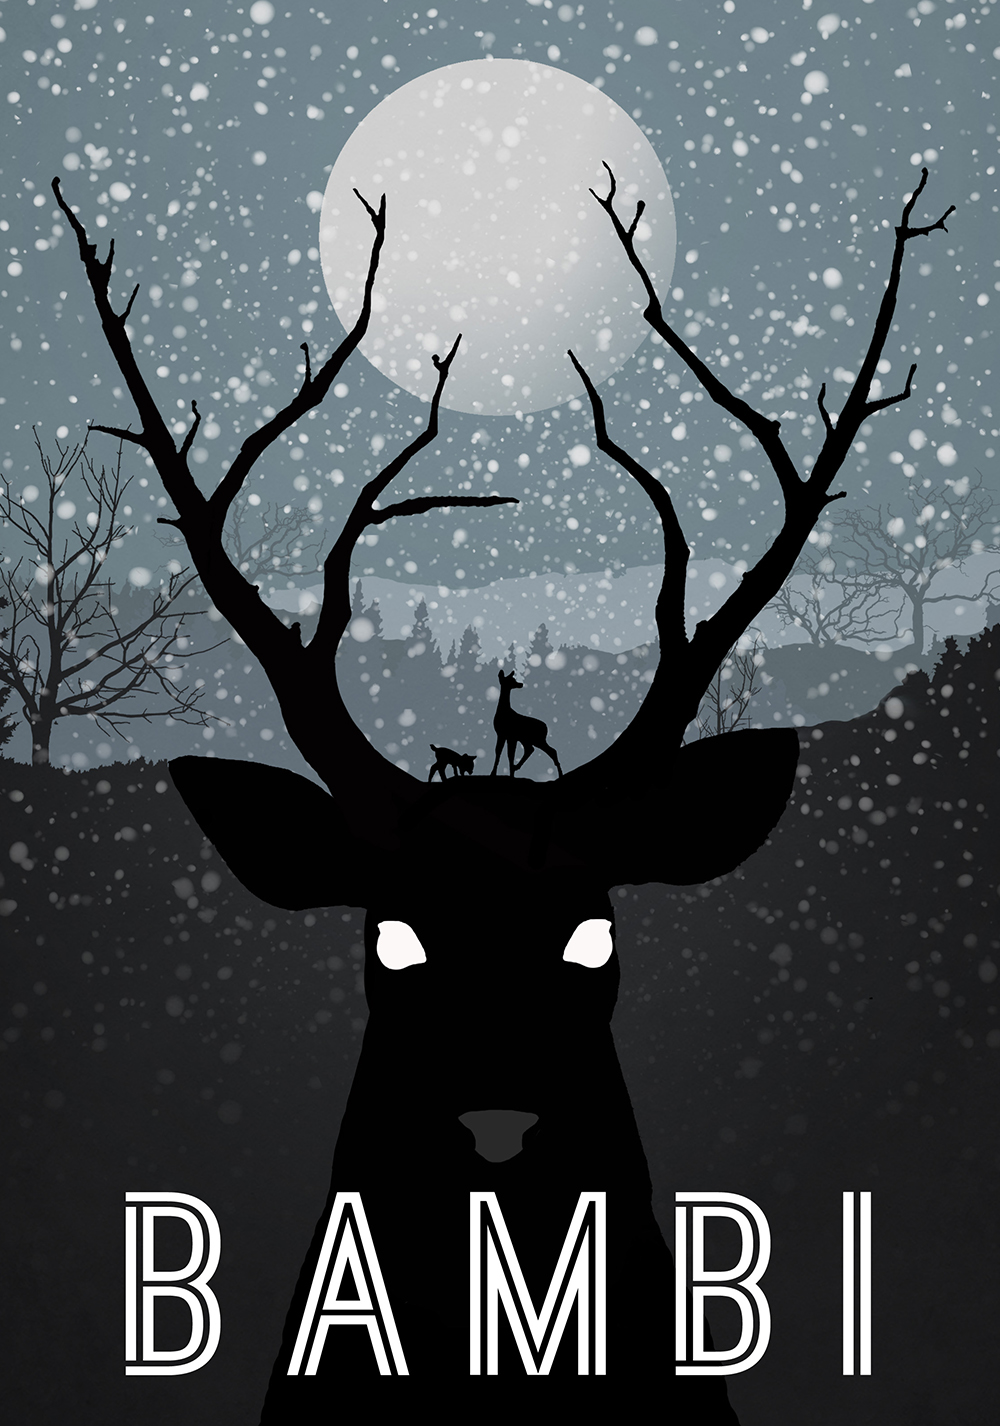 Bambi Film